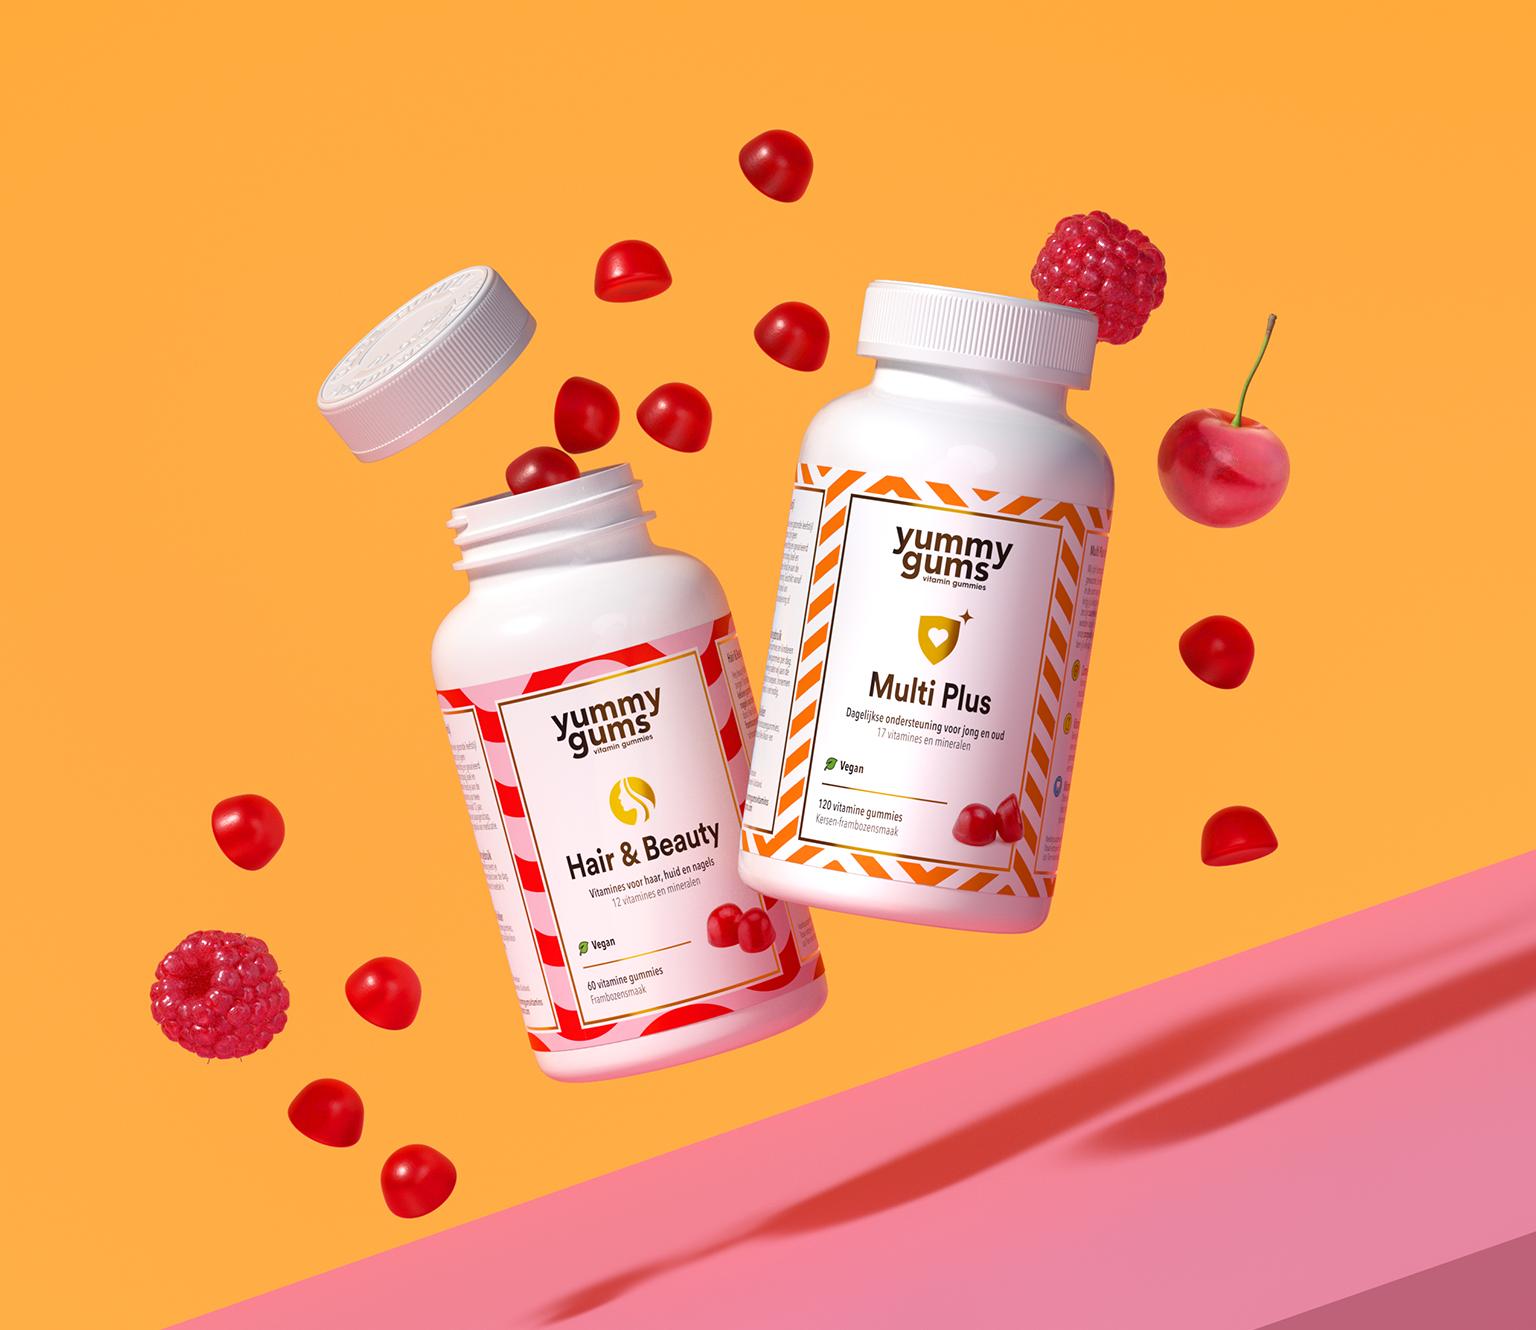 Vitamine kopen - Vegan vitamine - Yummygums